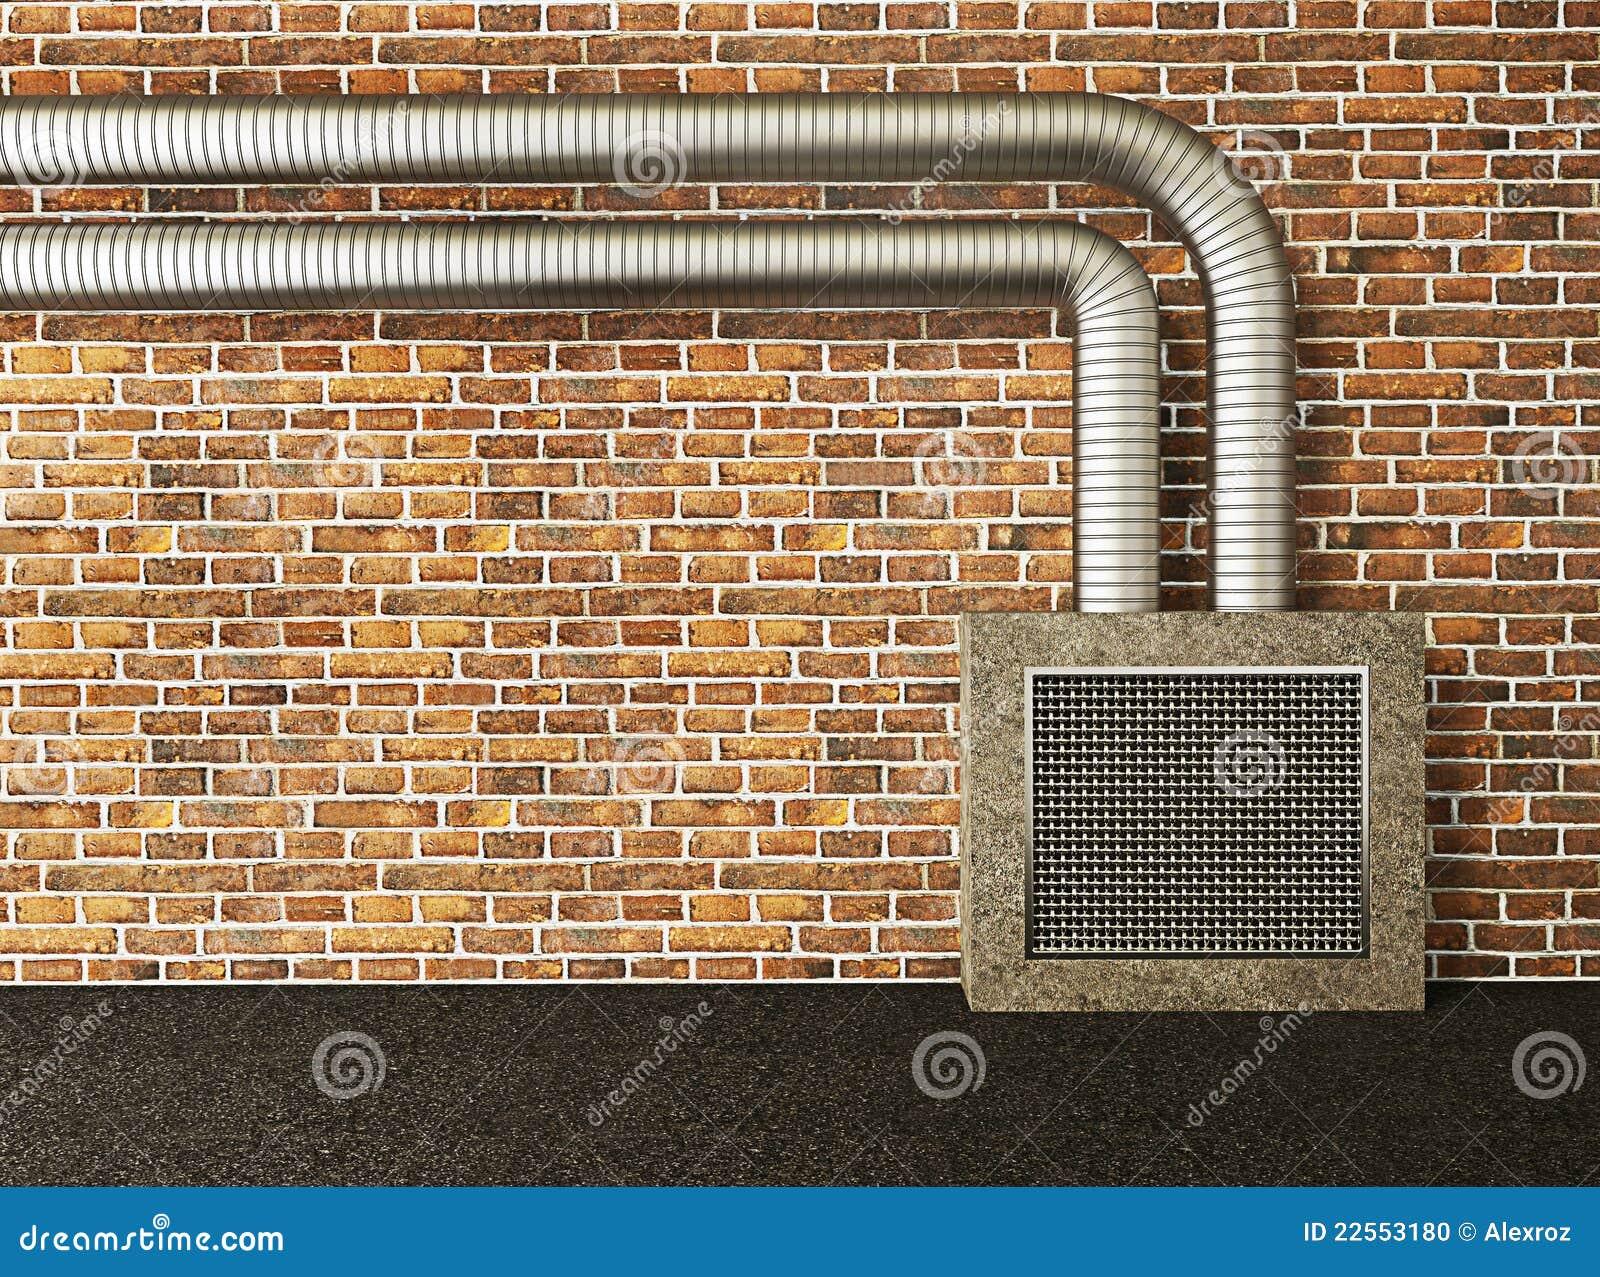 Industri le muur stock foto afbeelding 22553180 for Industriele muur